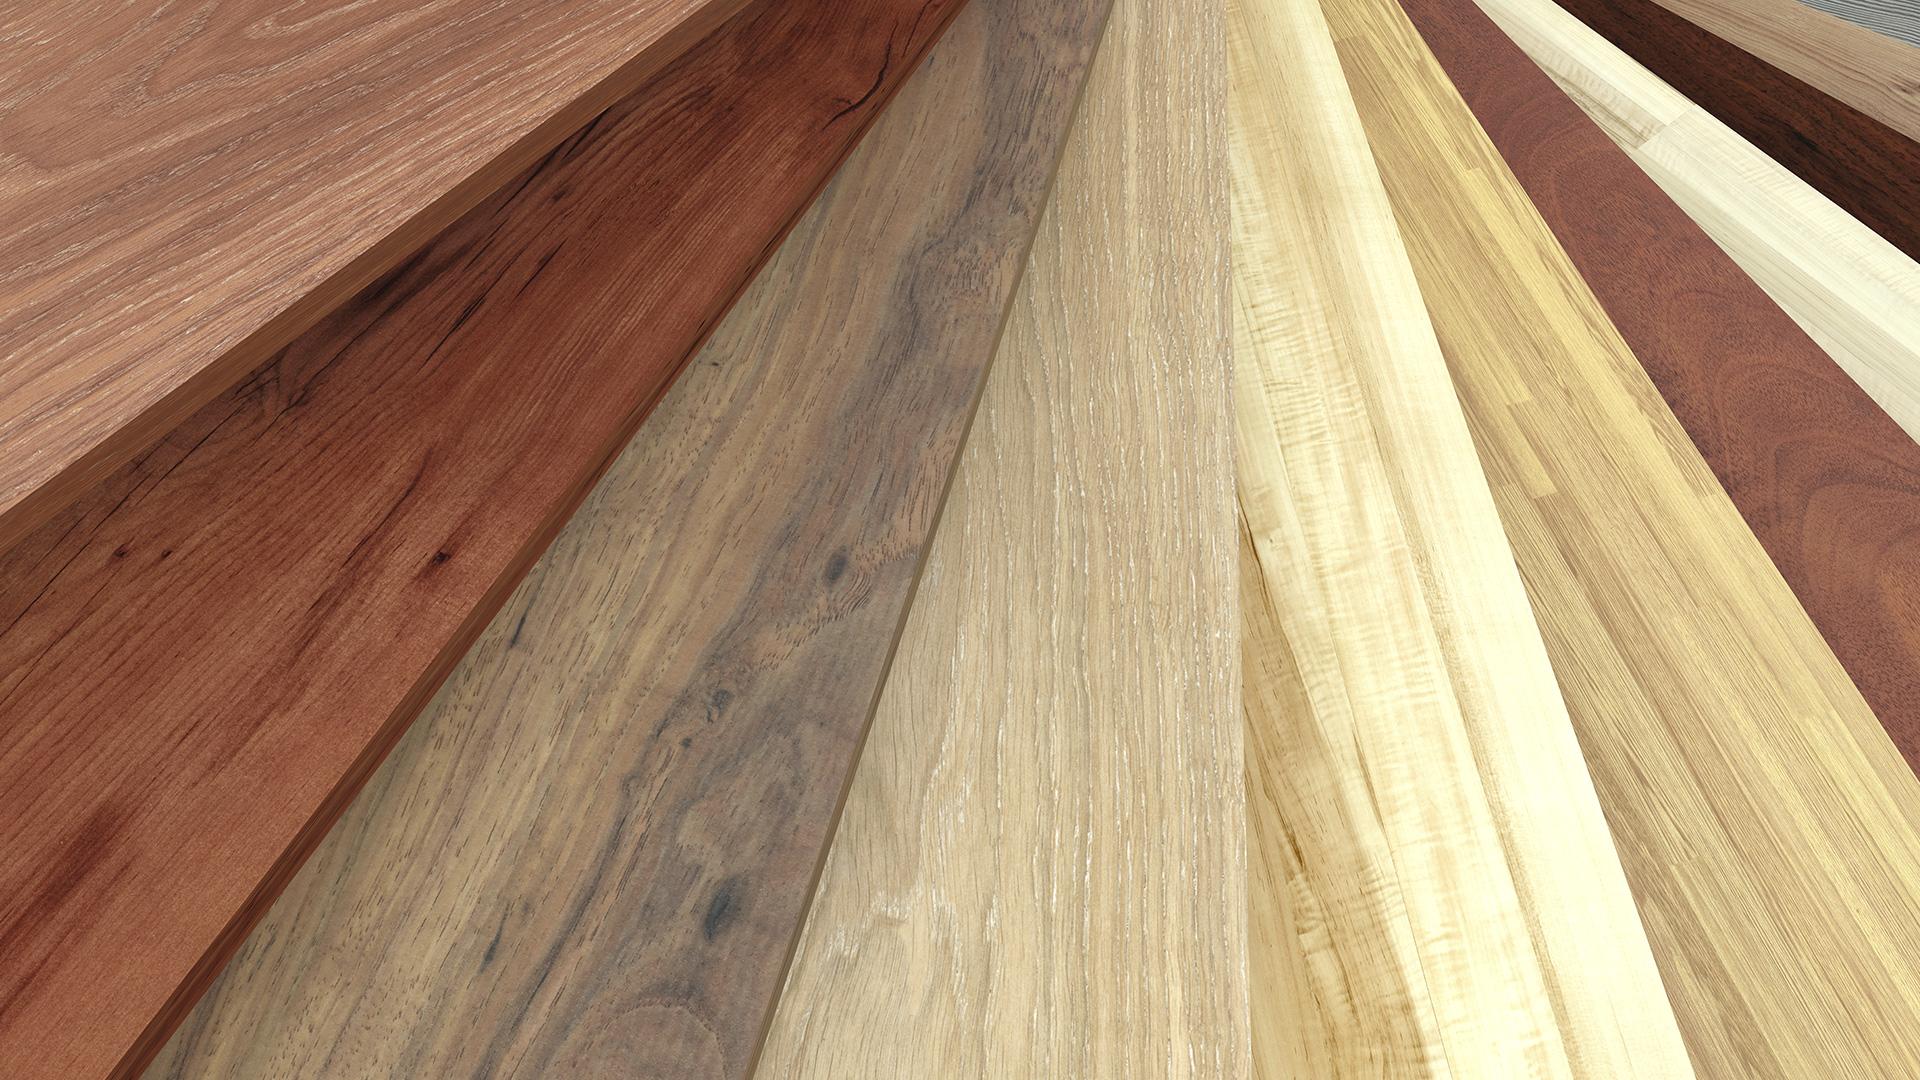 Joseph Frizado Floors Sunnyvale Flooring Installation Systems